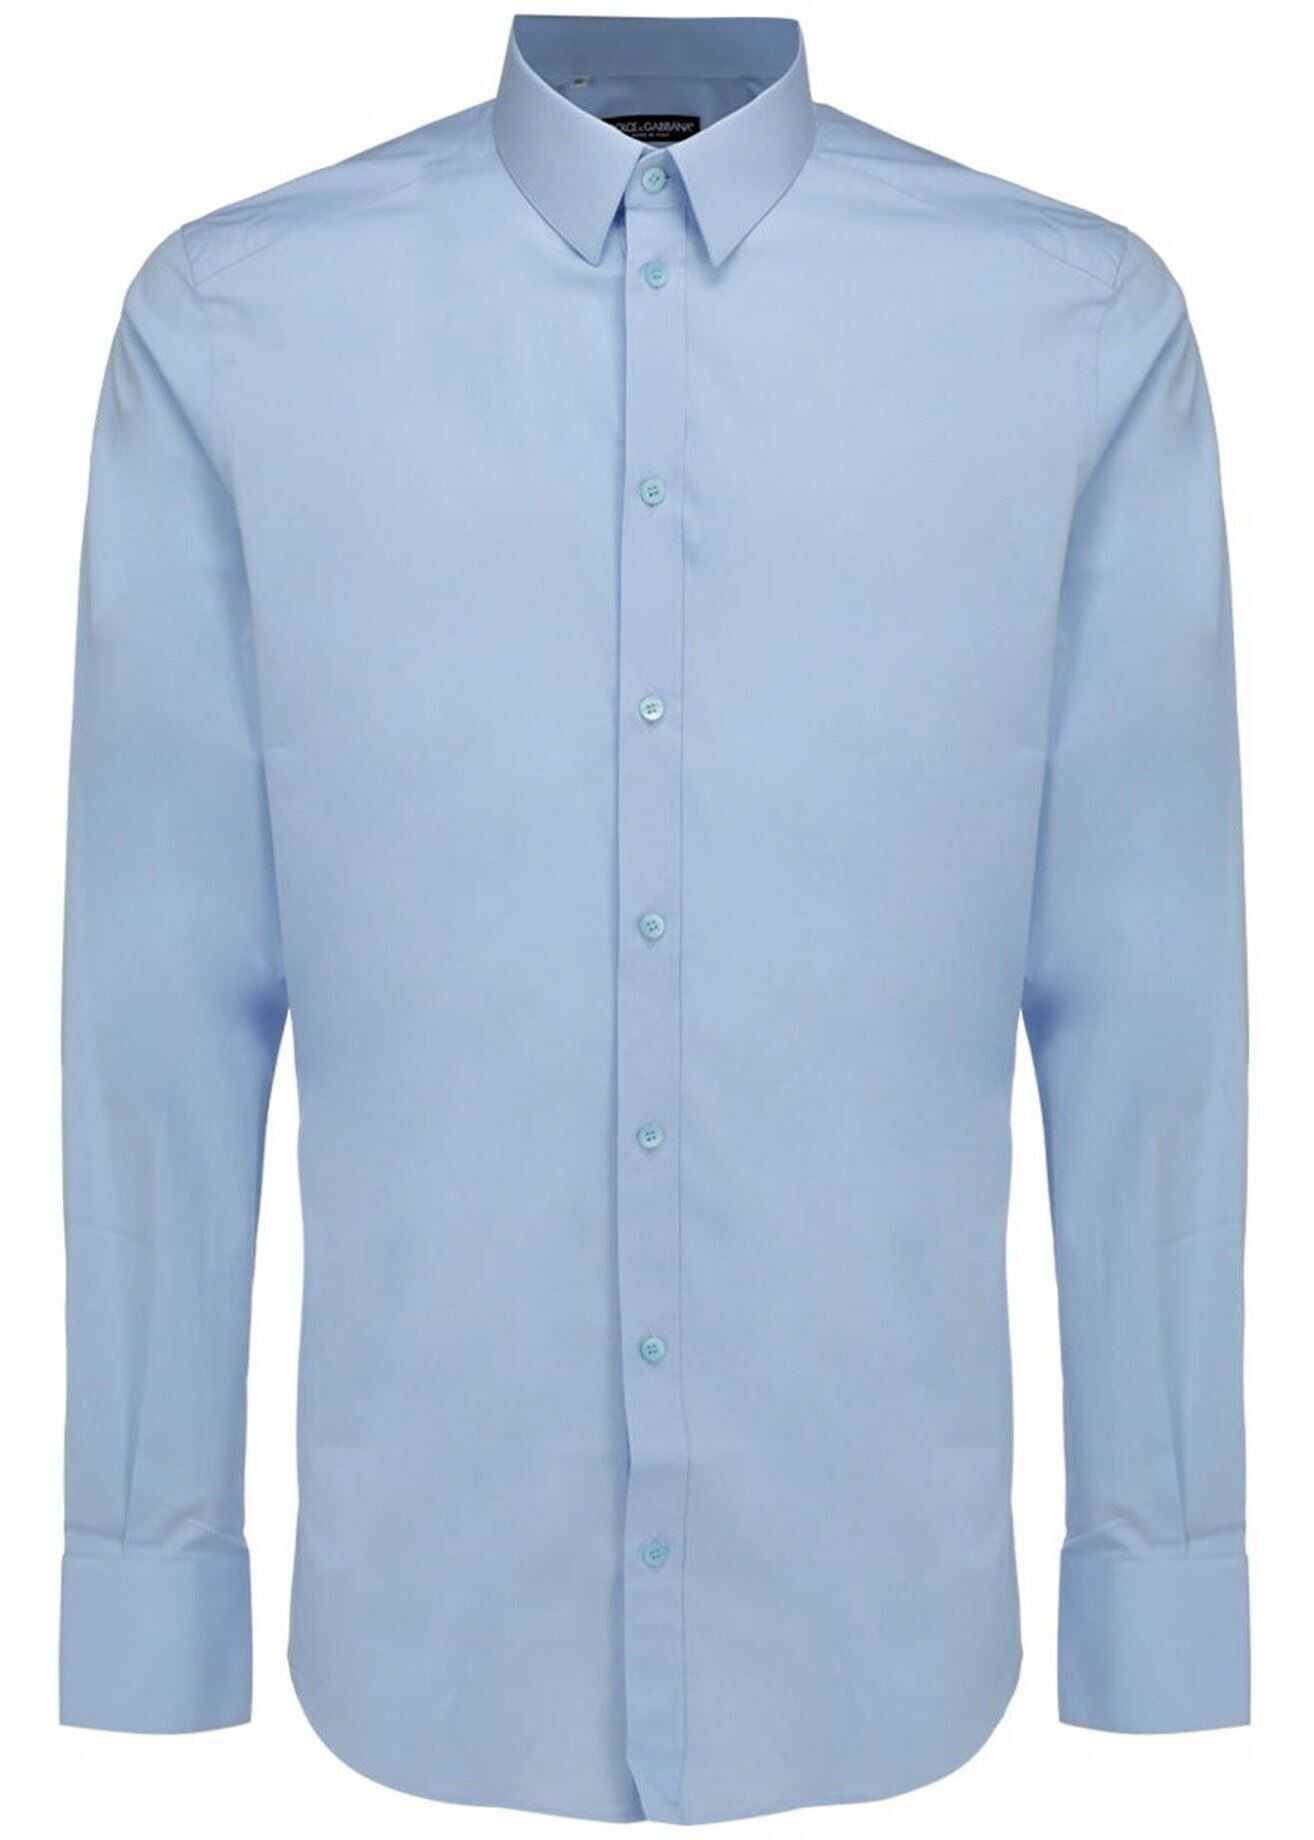 Dolce & Gabbana Cotton Poplin Shirt In Light Blue Light Blue imagine